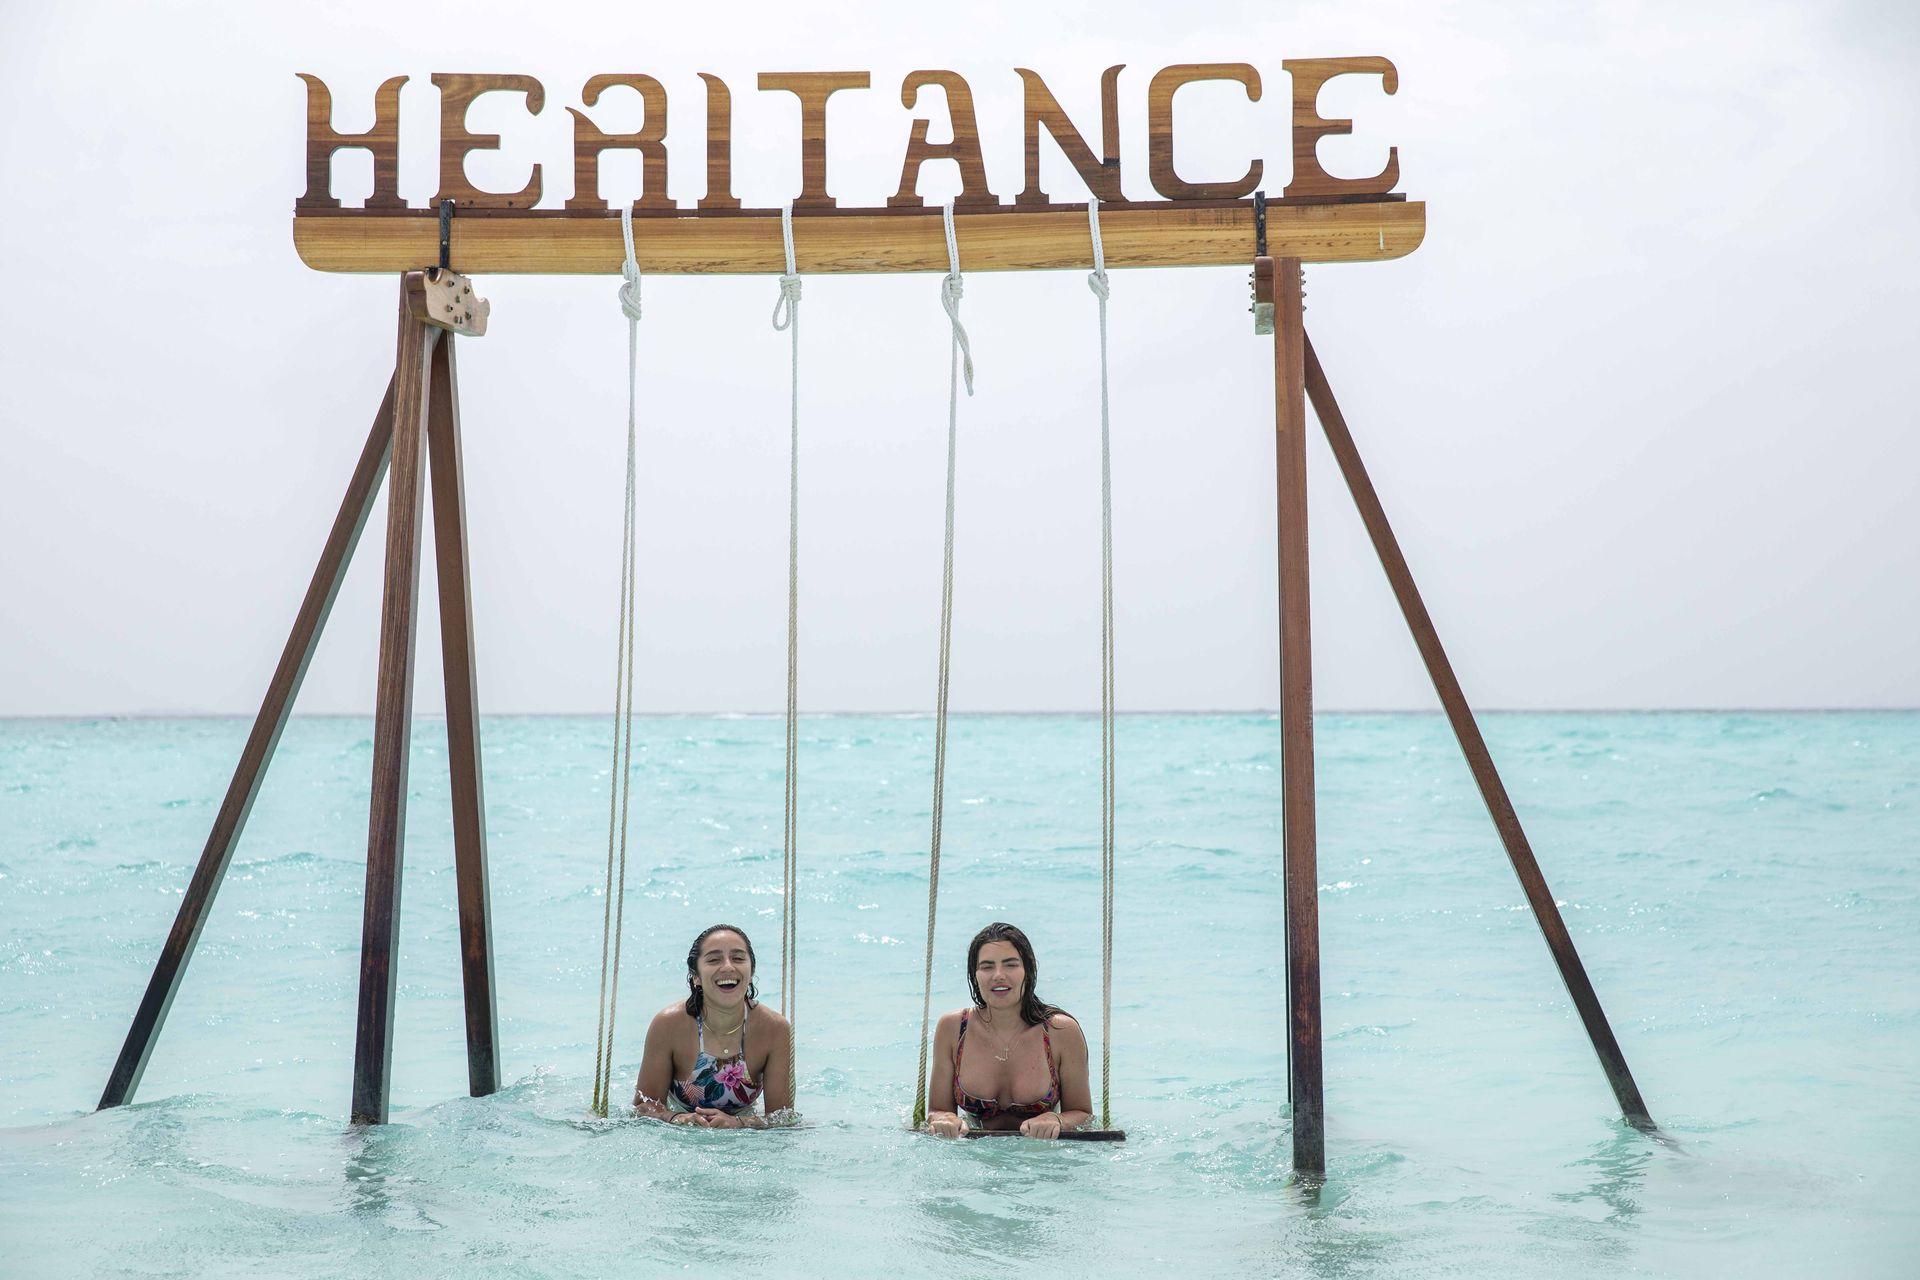 Megan Barton Hanson And Her Girlfriend Seen Enjoying Their Lesbian Holiday 0003